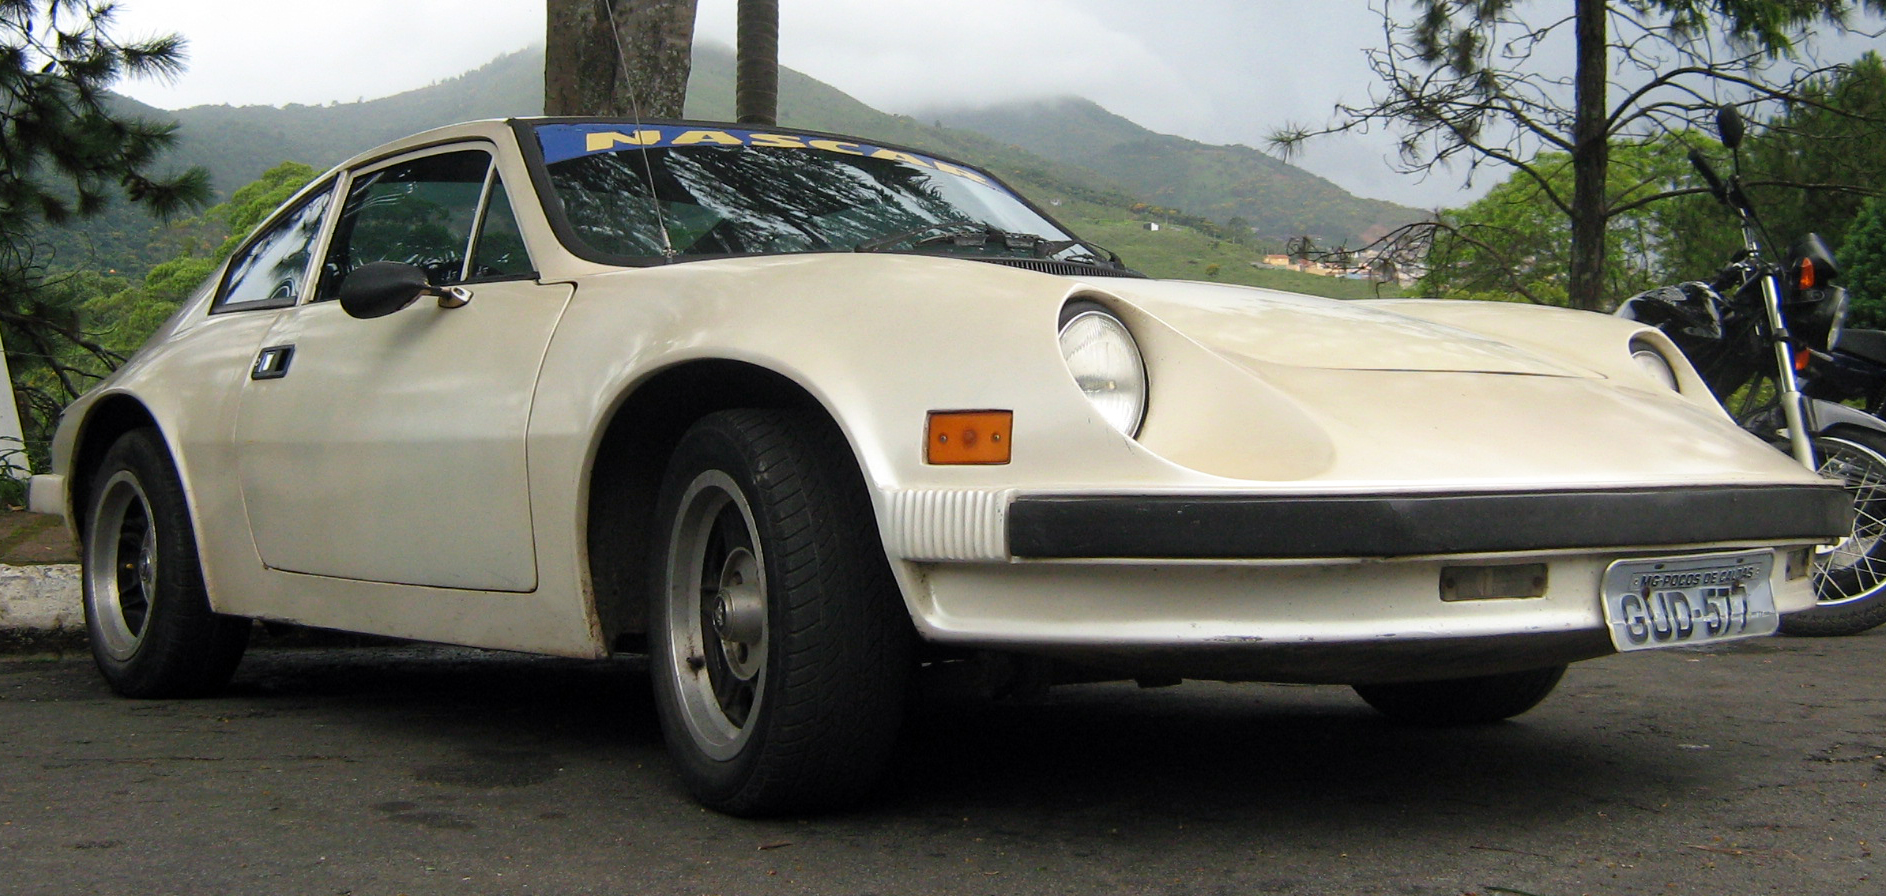 File:1981-1984 Puma GTI Coupé.jpg - Wikimedia Commons